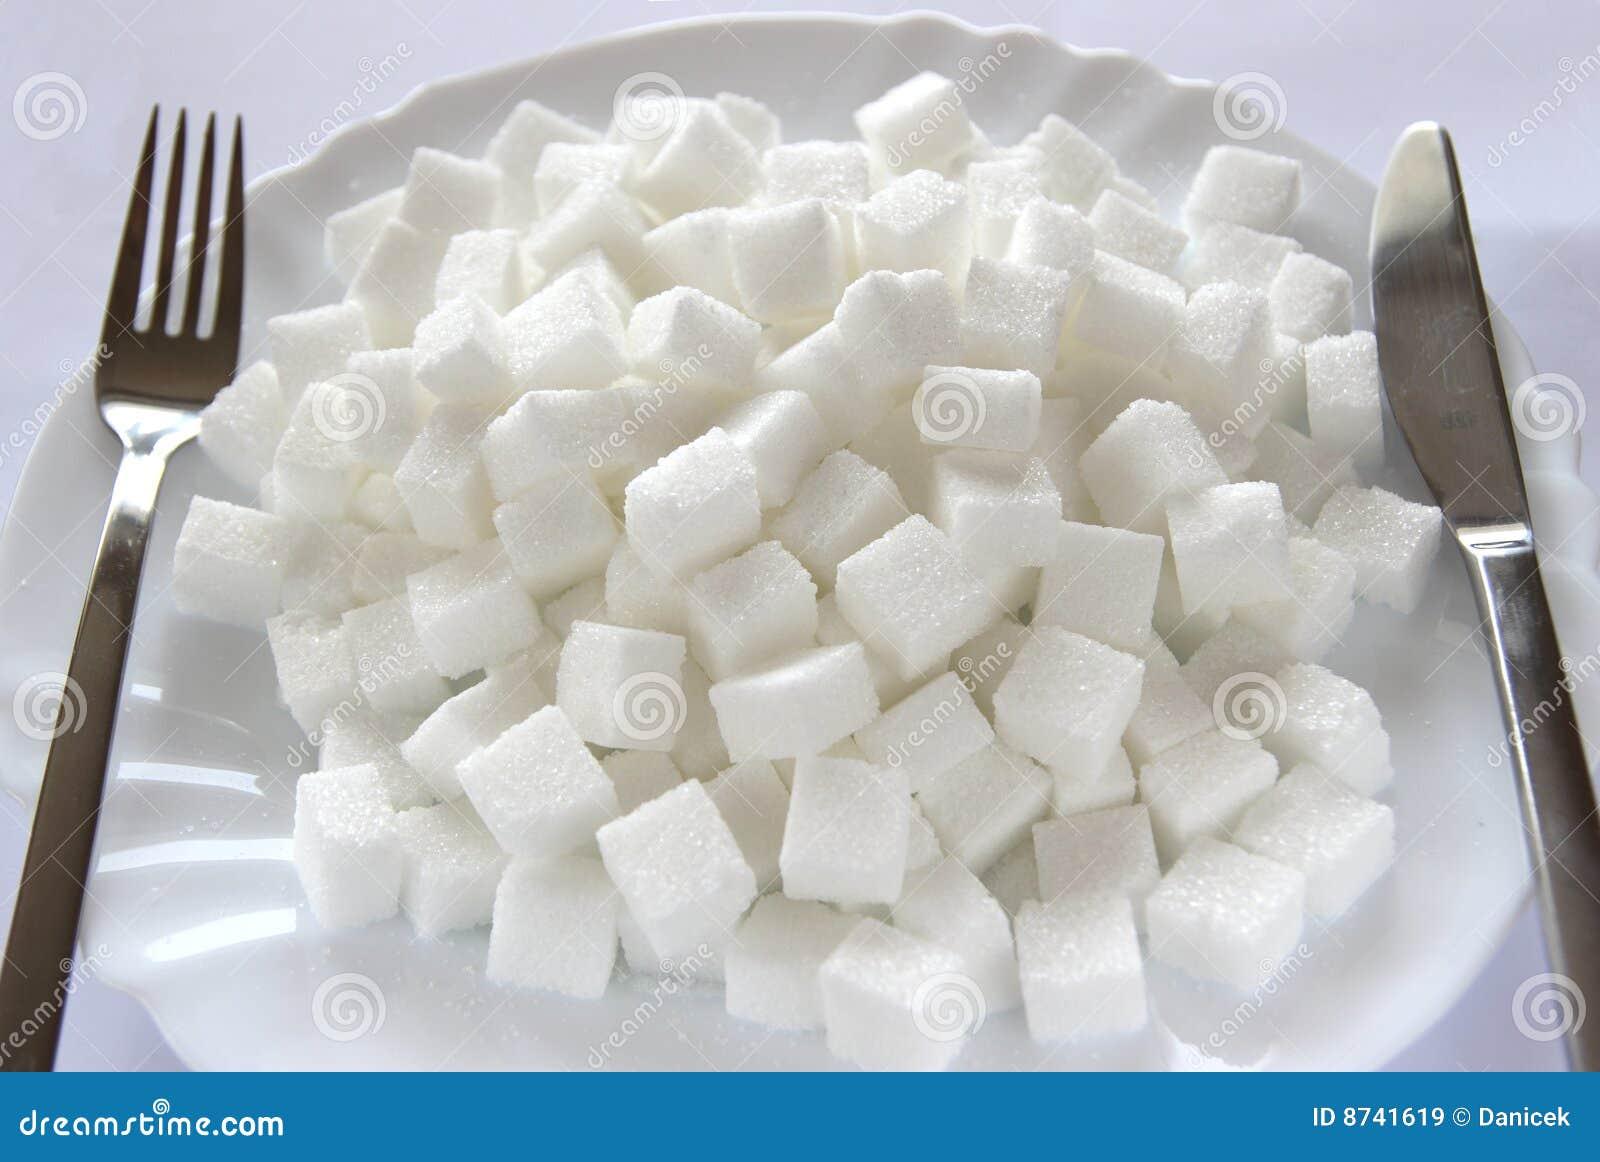 сахар плиты кубиков